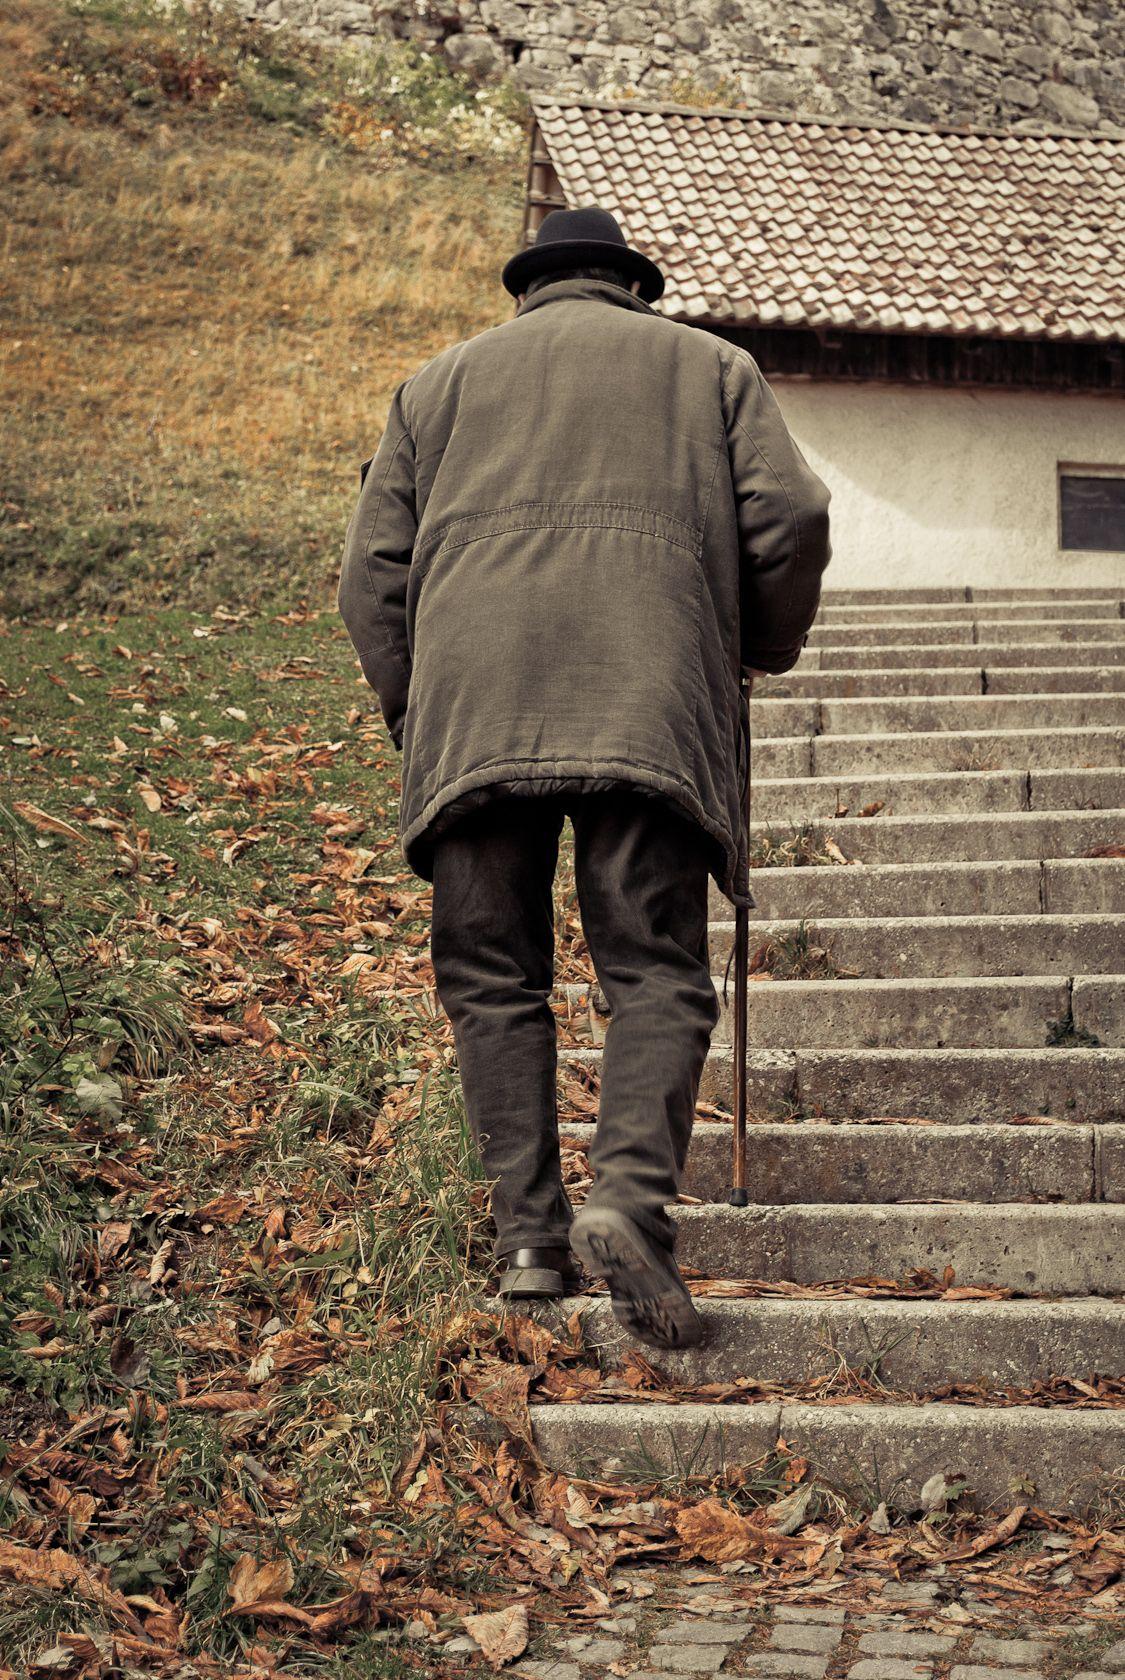 elderly man walking - photo #13